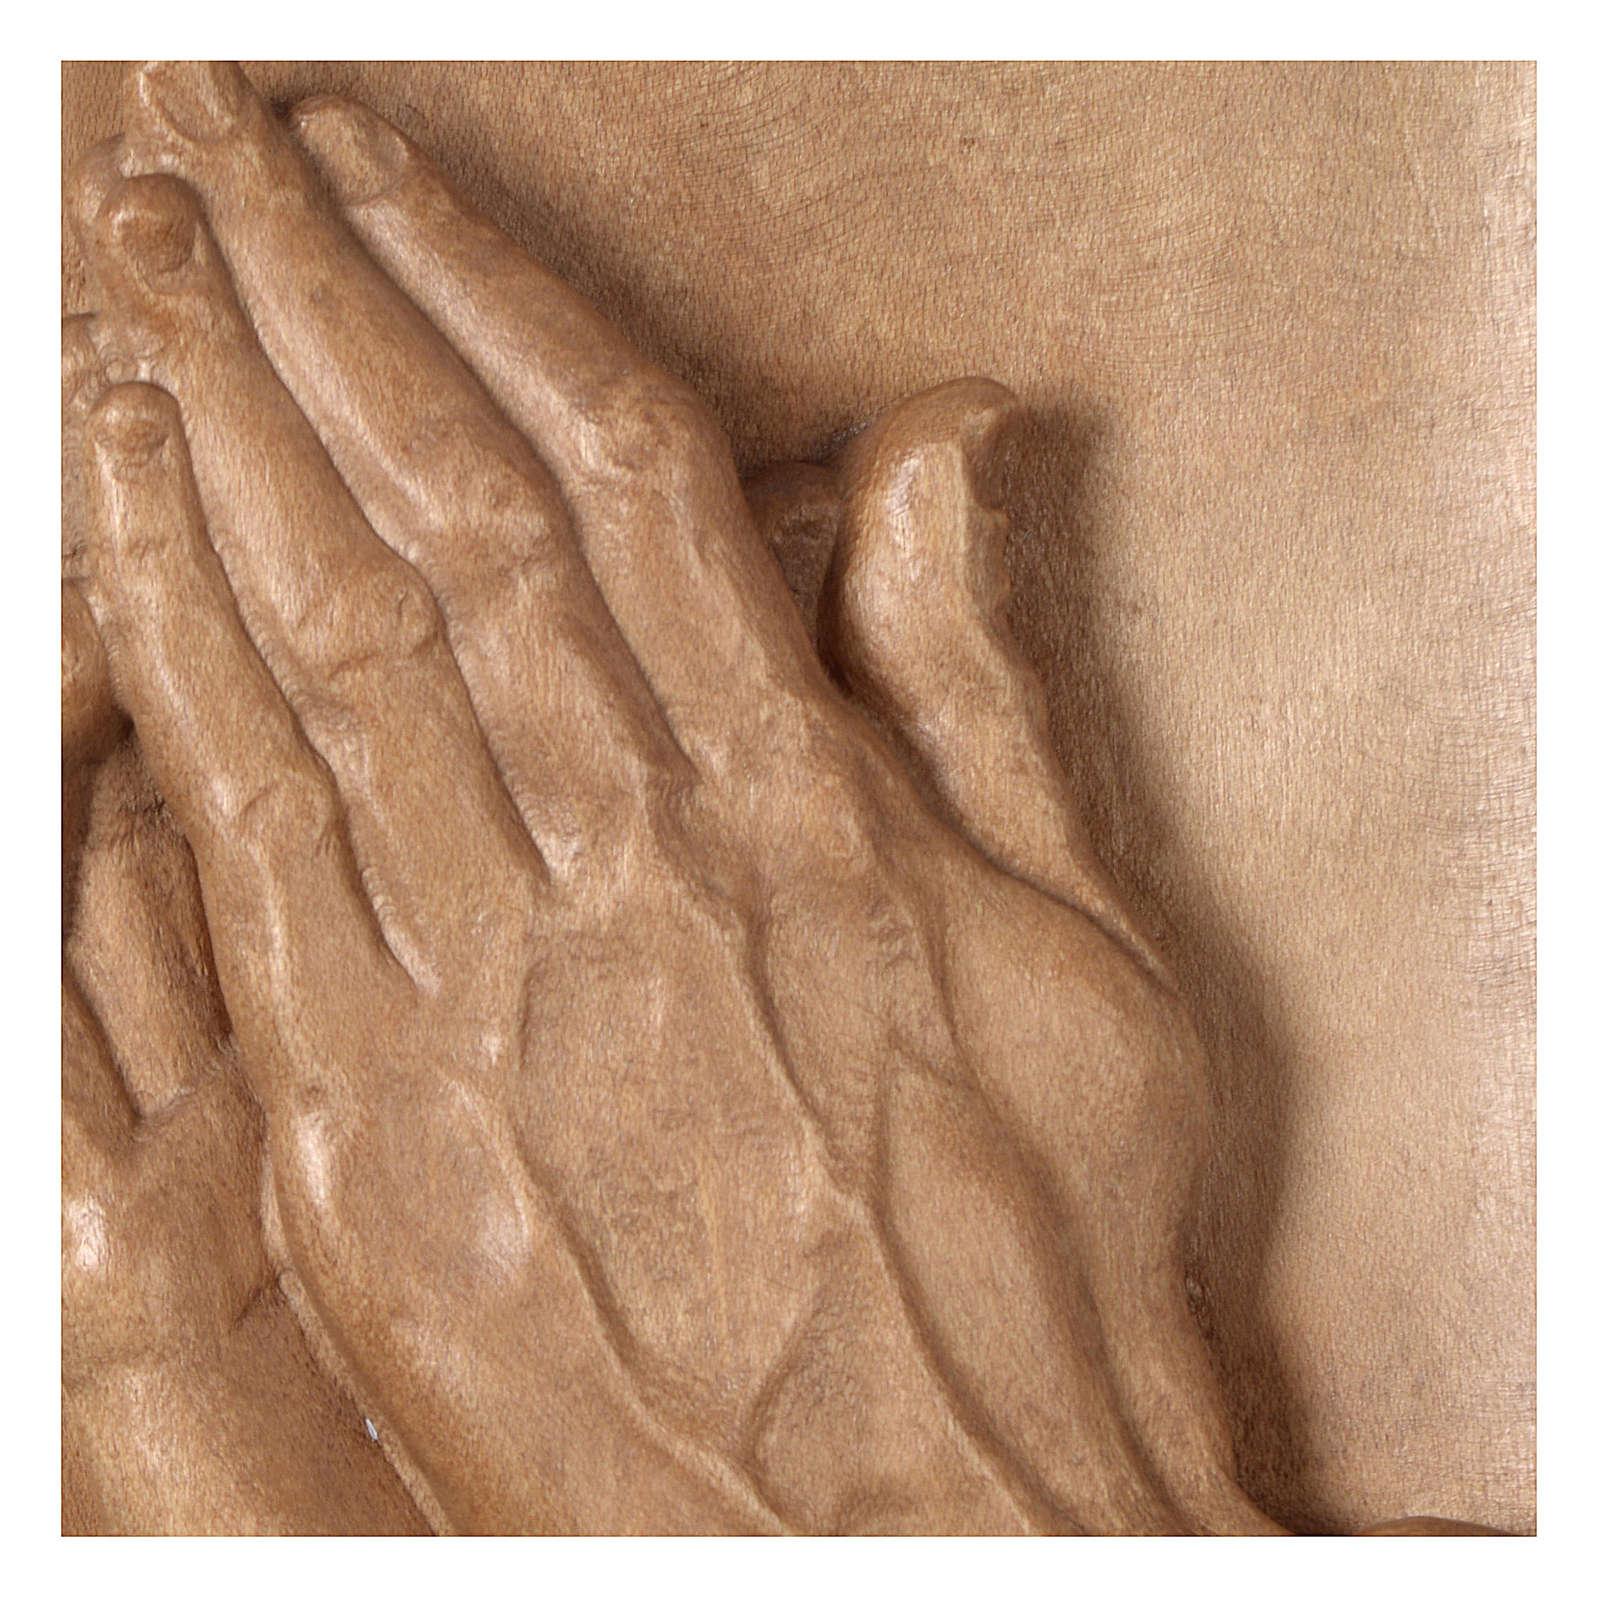 Bas-relief mains jointes bois Valgardena patiné 4